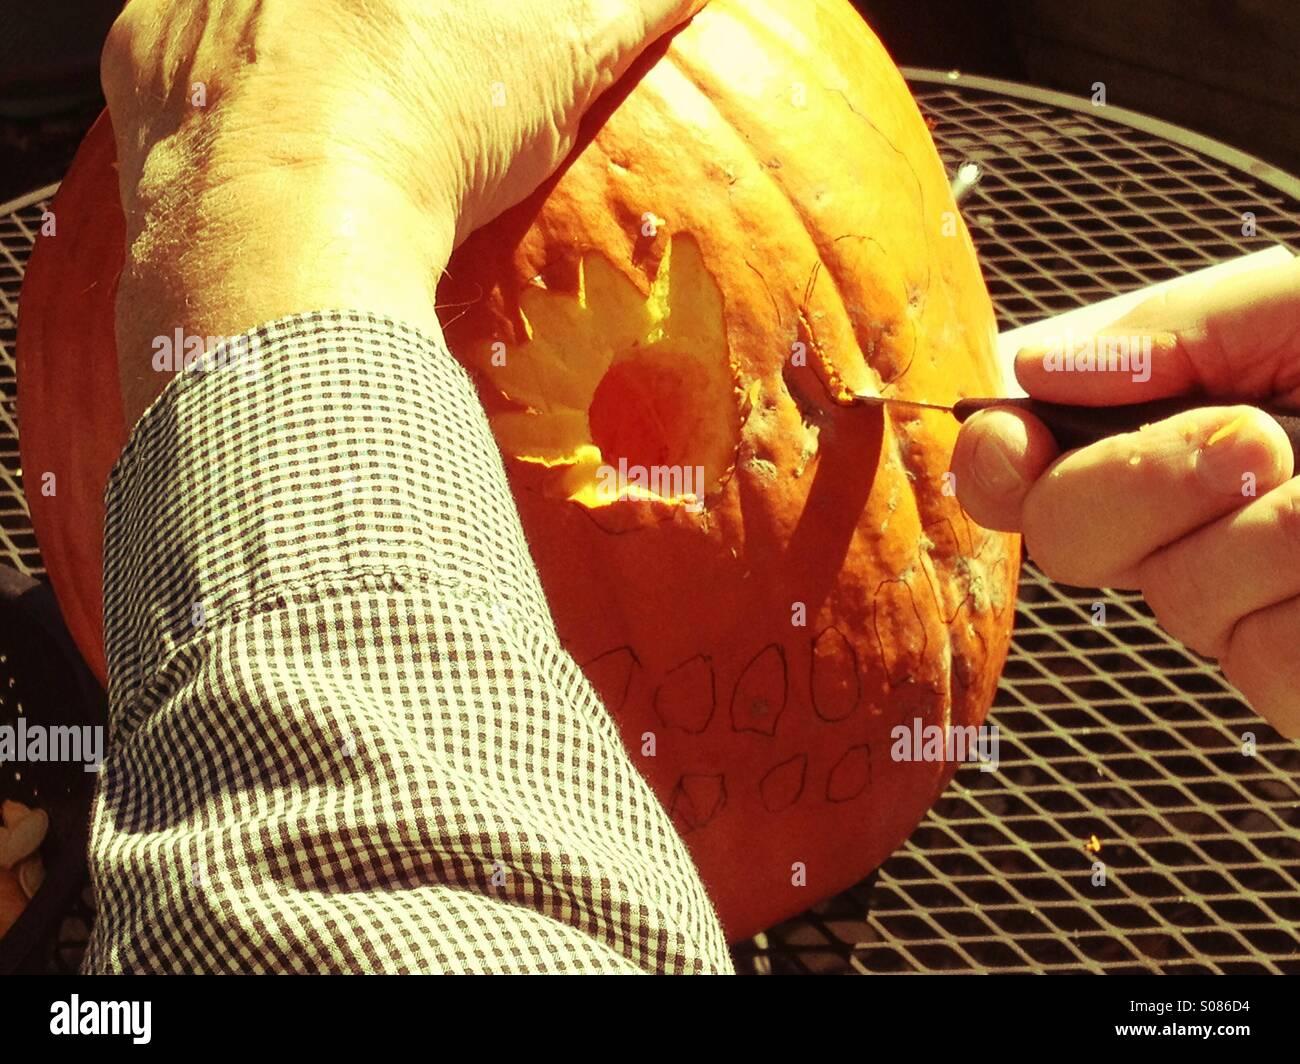 Man carves pumpkin at Halloween - Stock Image